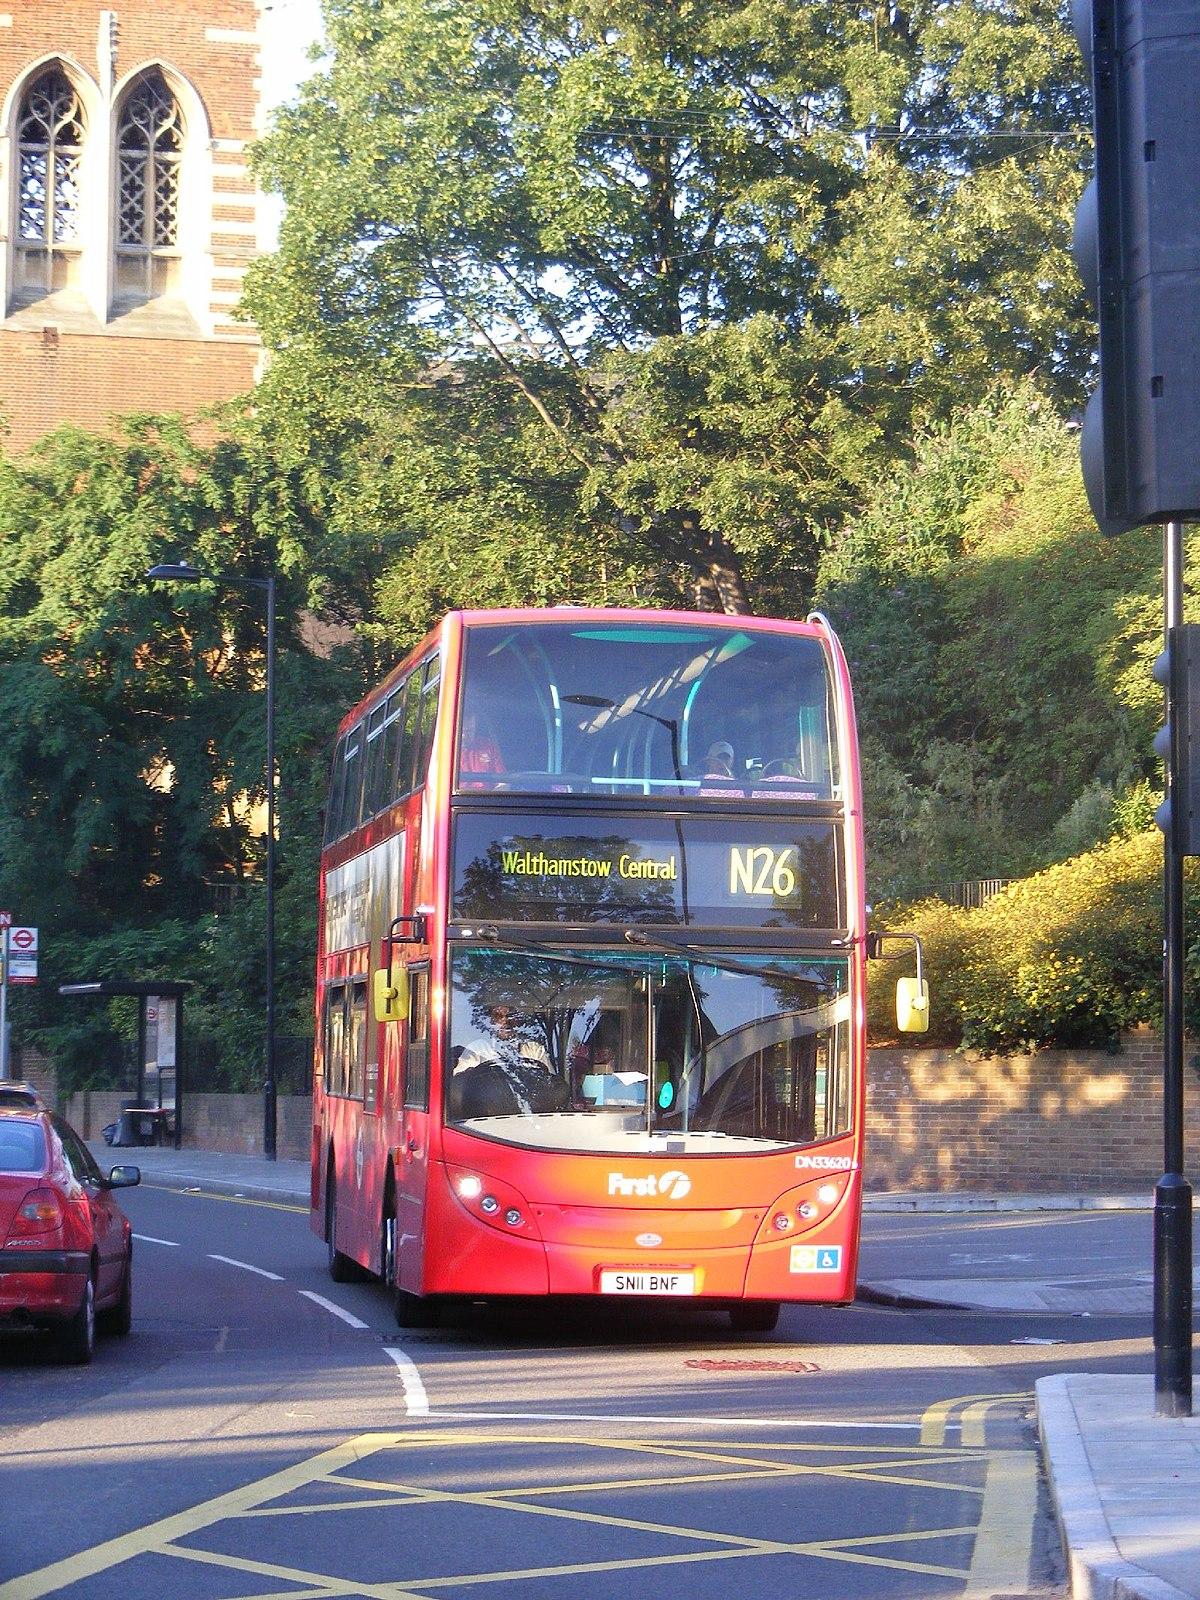 Bus line 1 n15 - 1 part 10